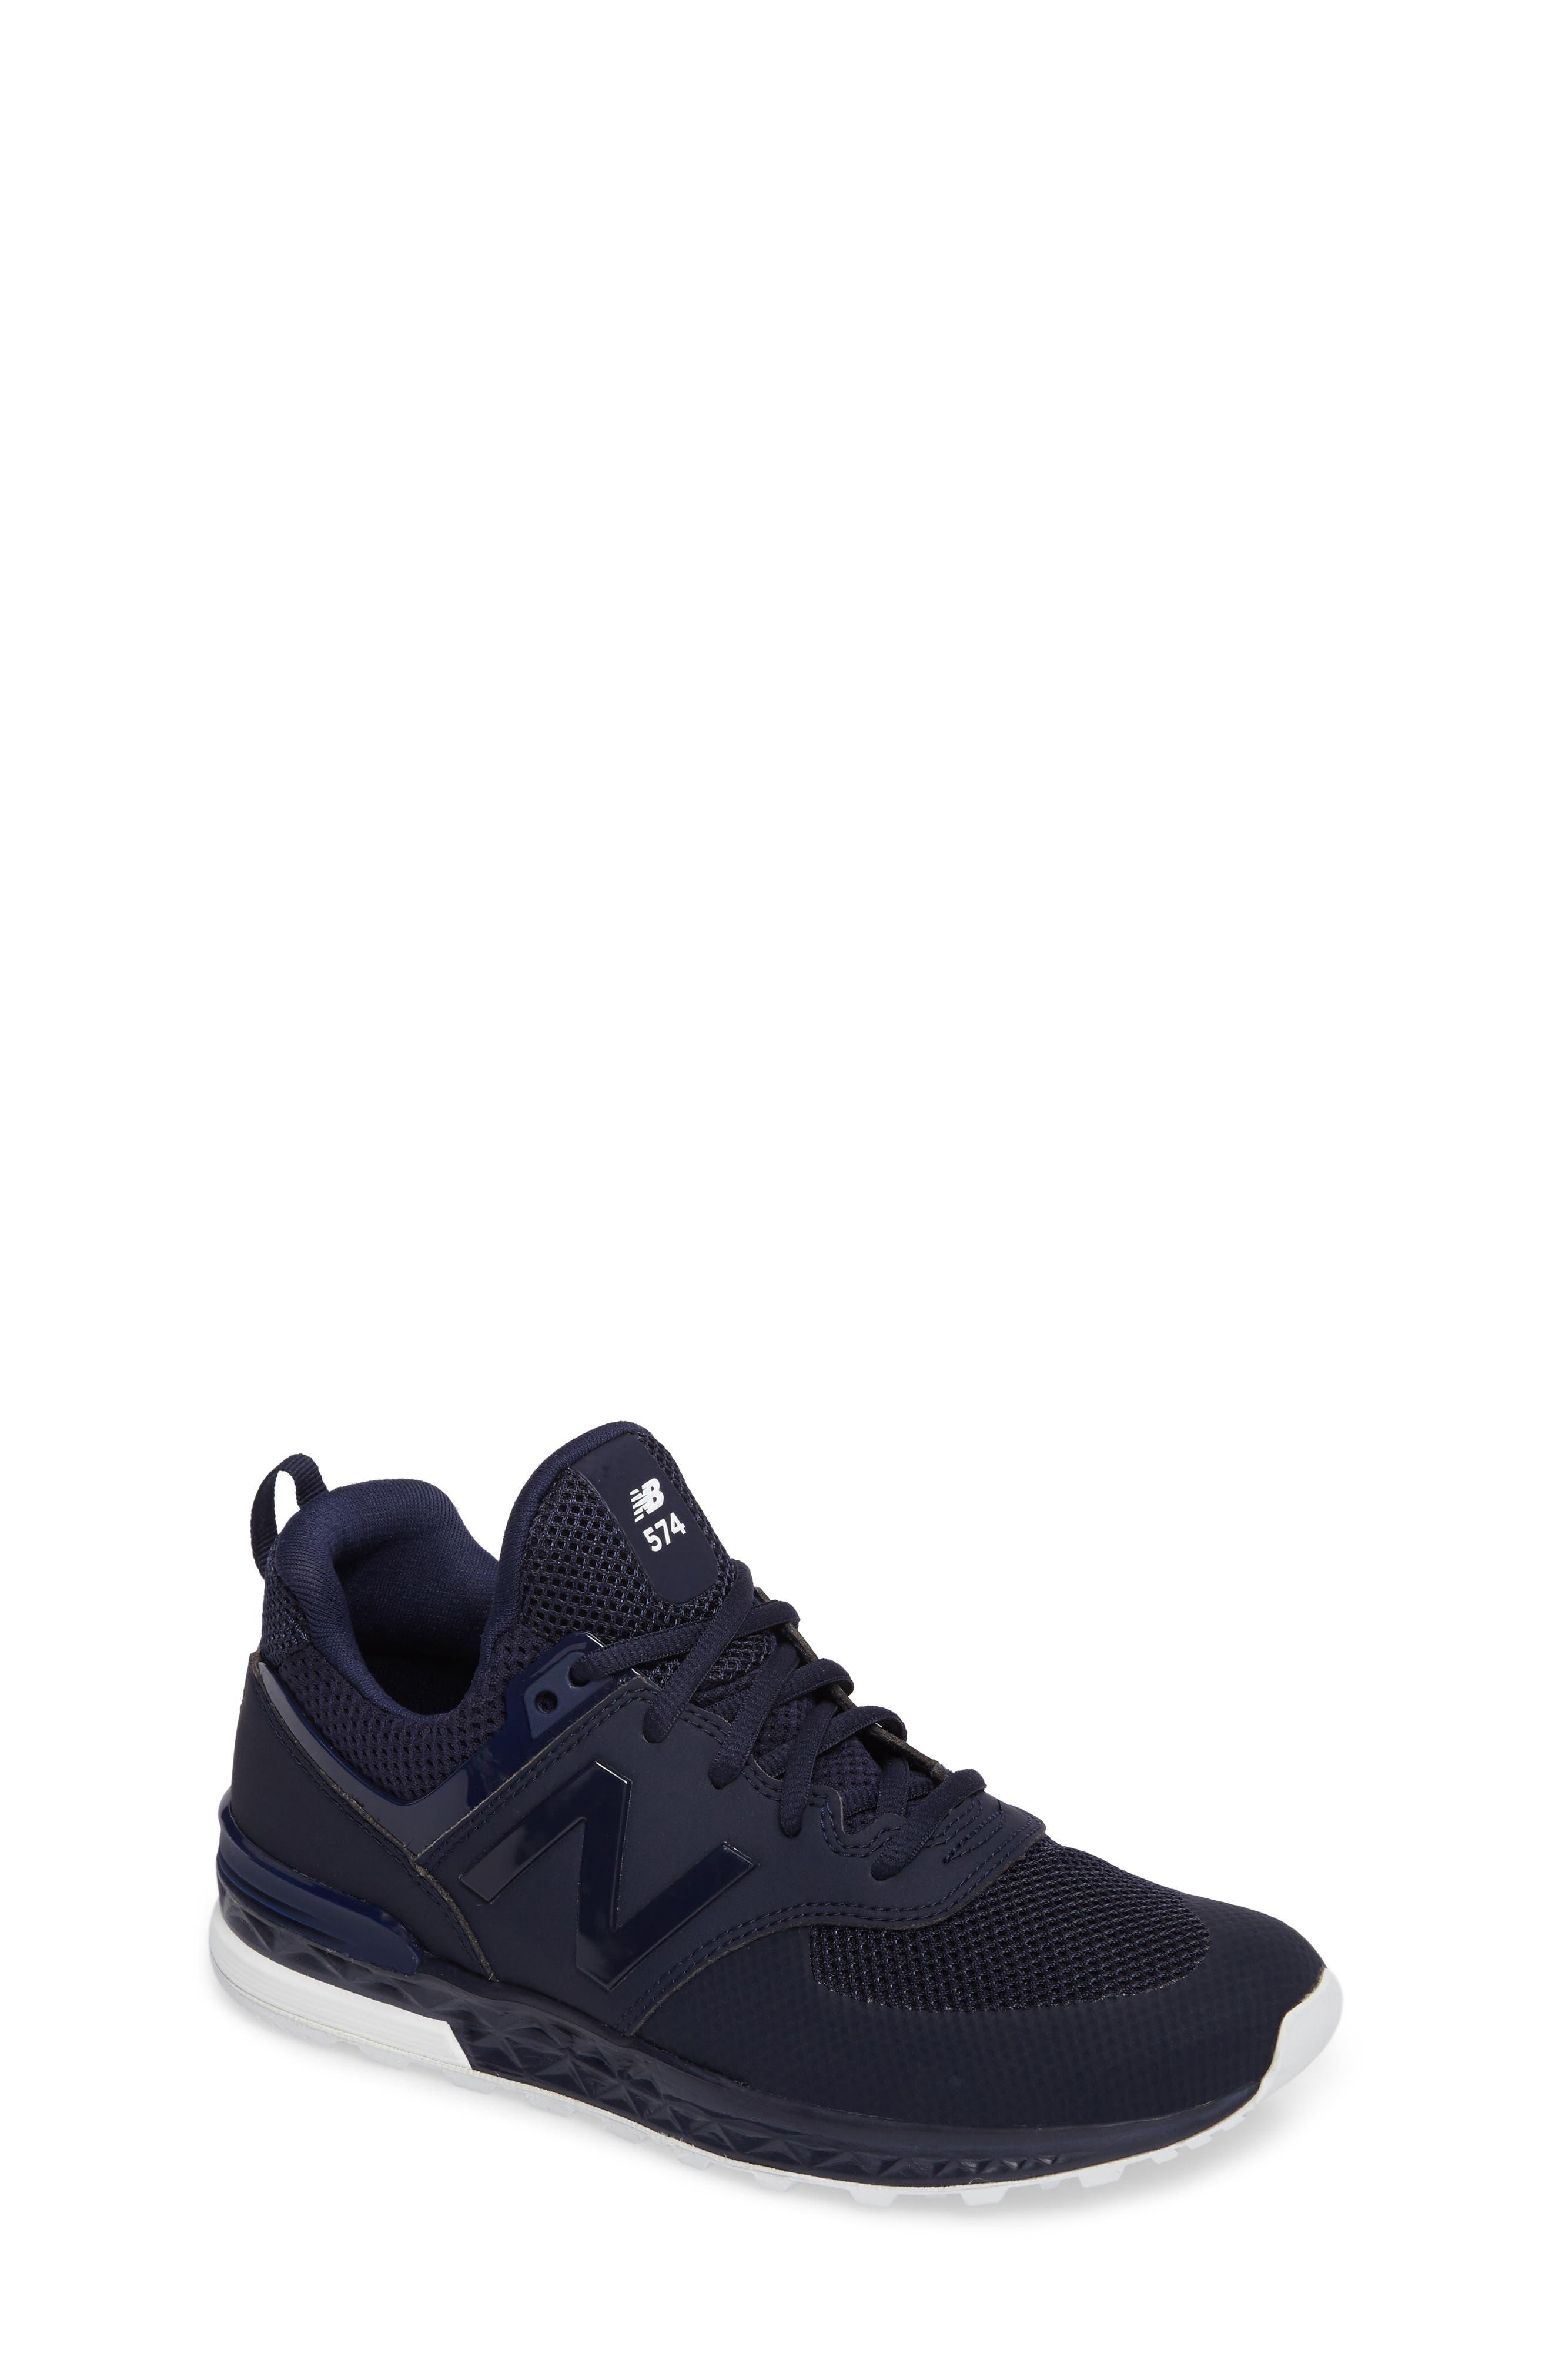 Main Image - New Balance 574 Sport Sneaker (Baby, Walker, Toddler, Little Kid & Big Kid)